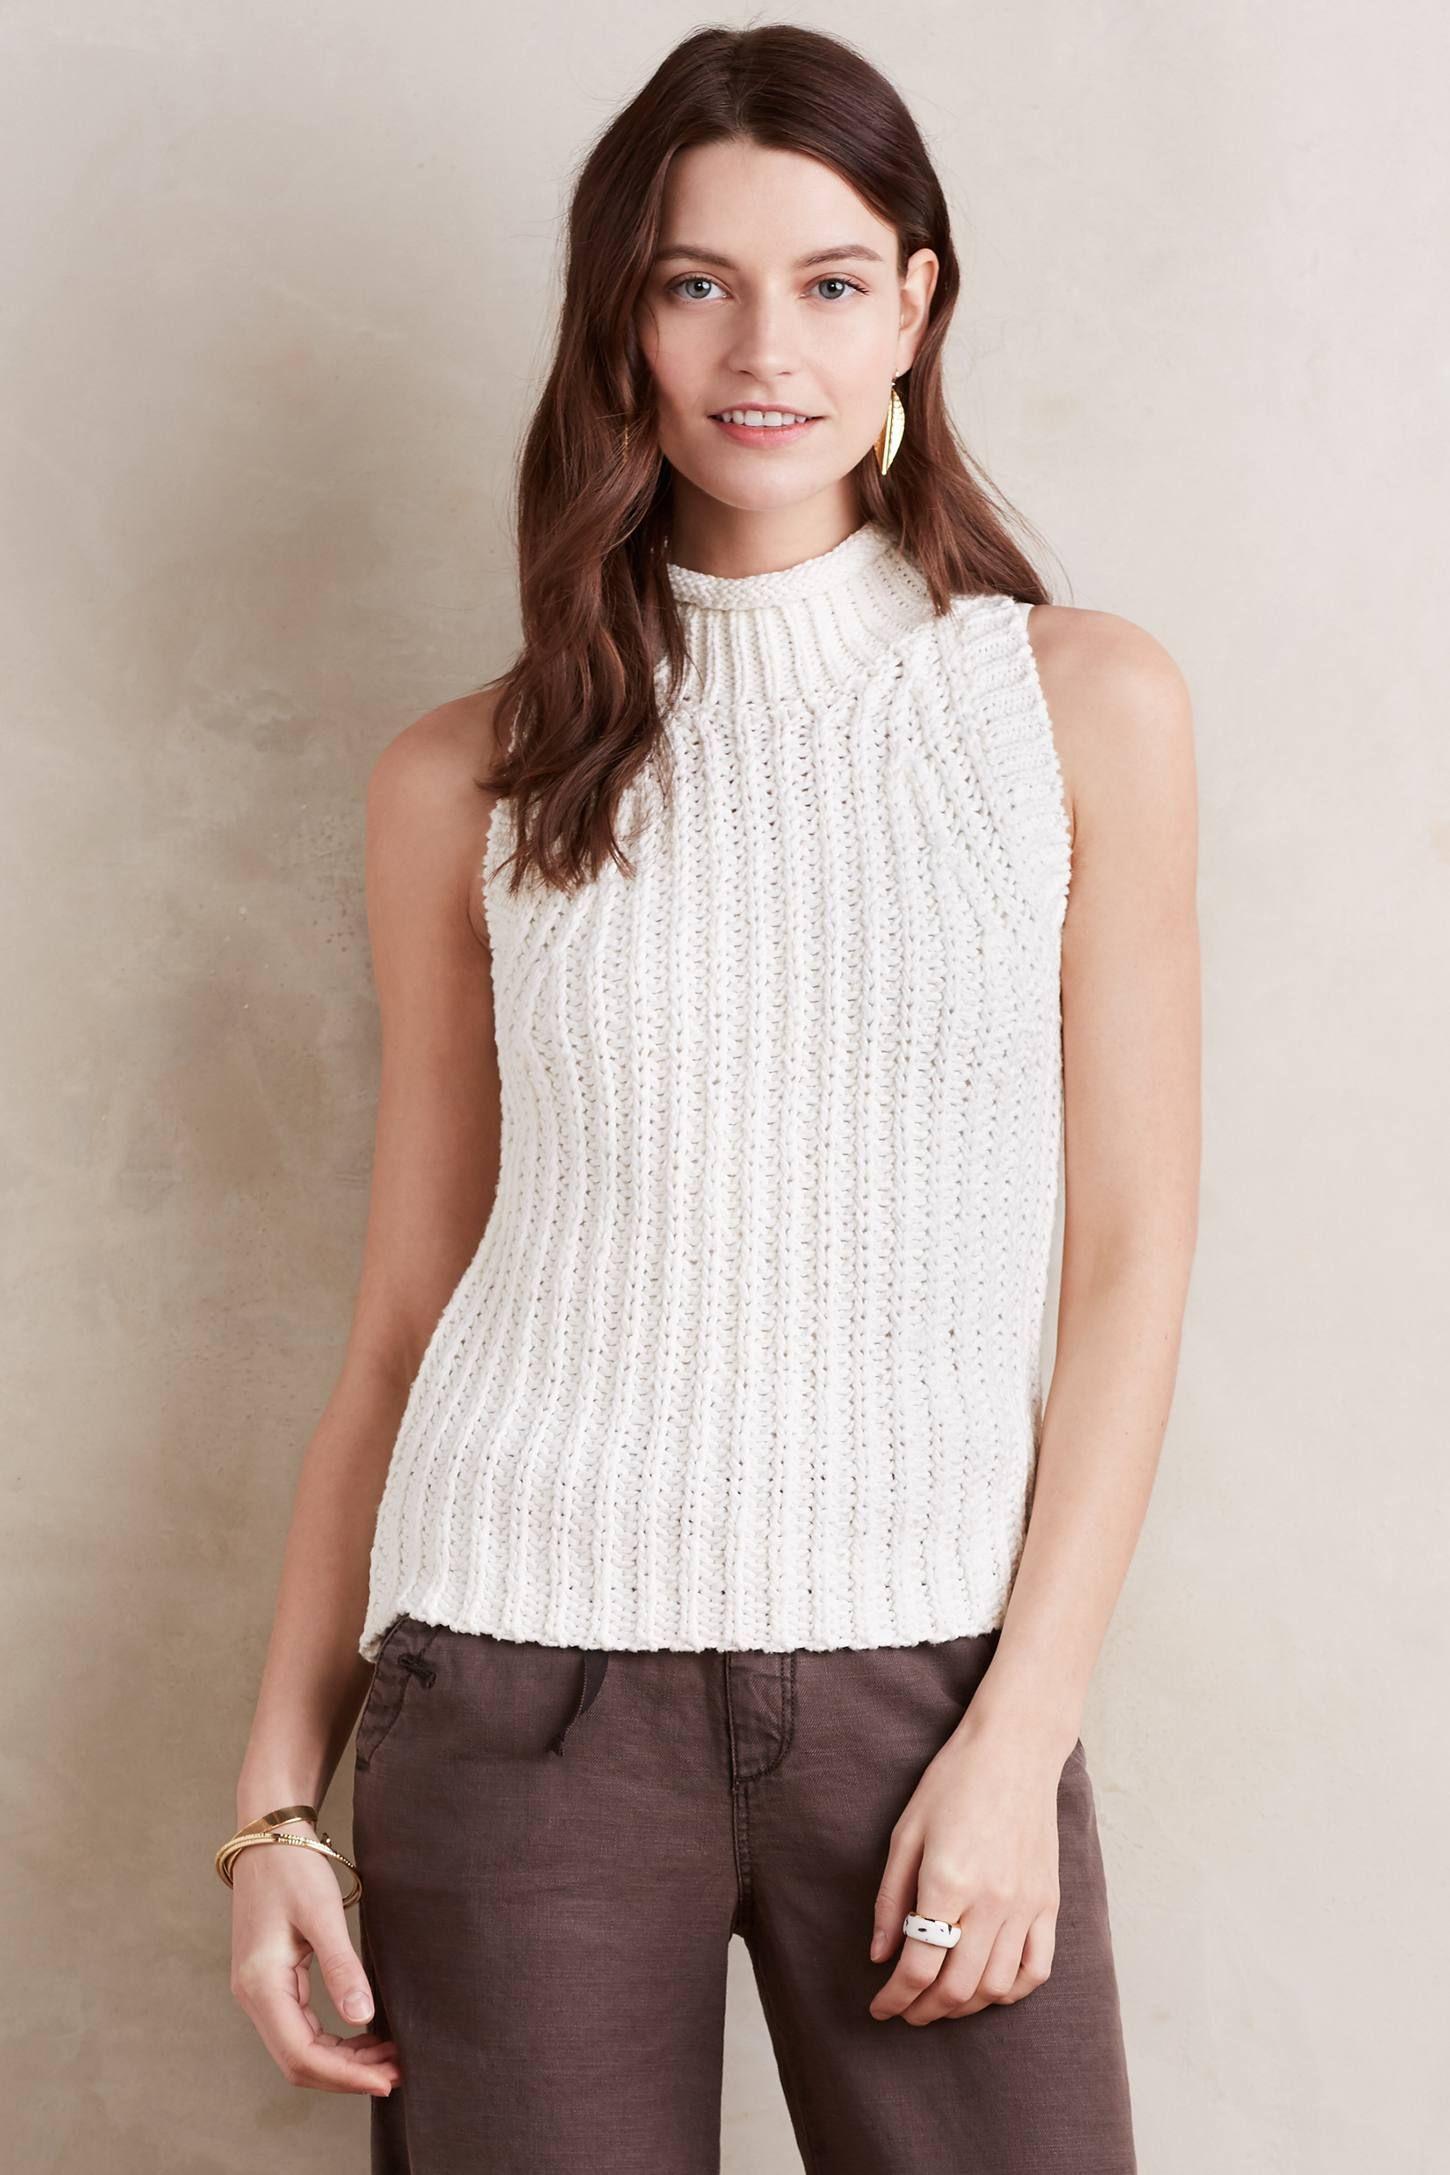 92d98b603e Roll-Neck Knit Tank | Make a Statement | Roll neck sweater, Knitted ...